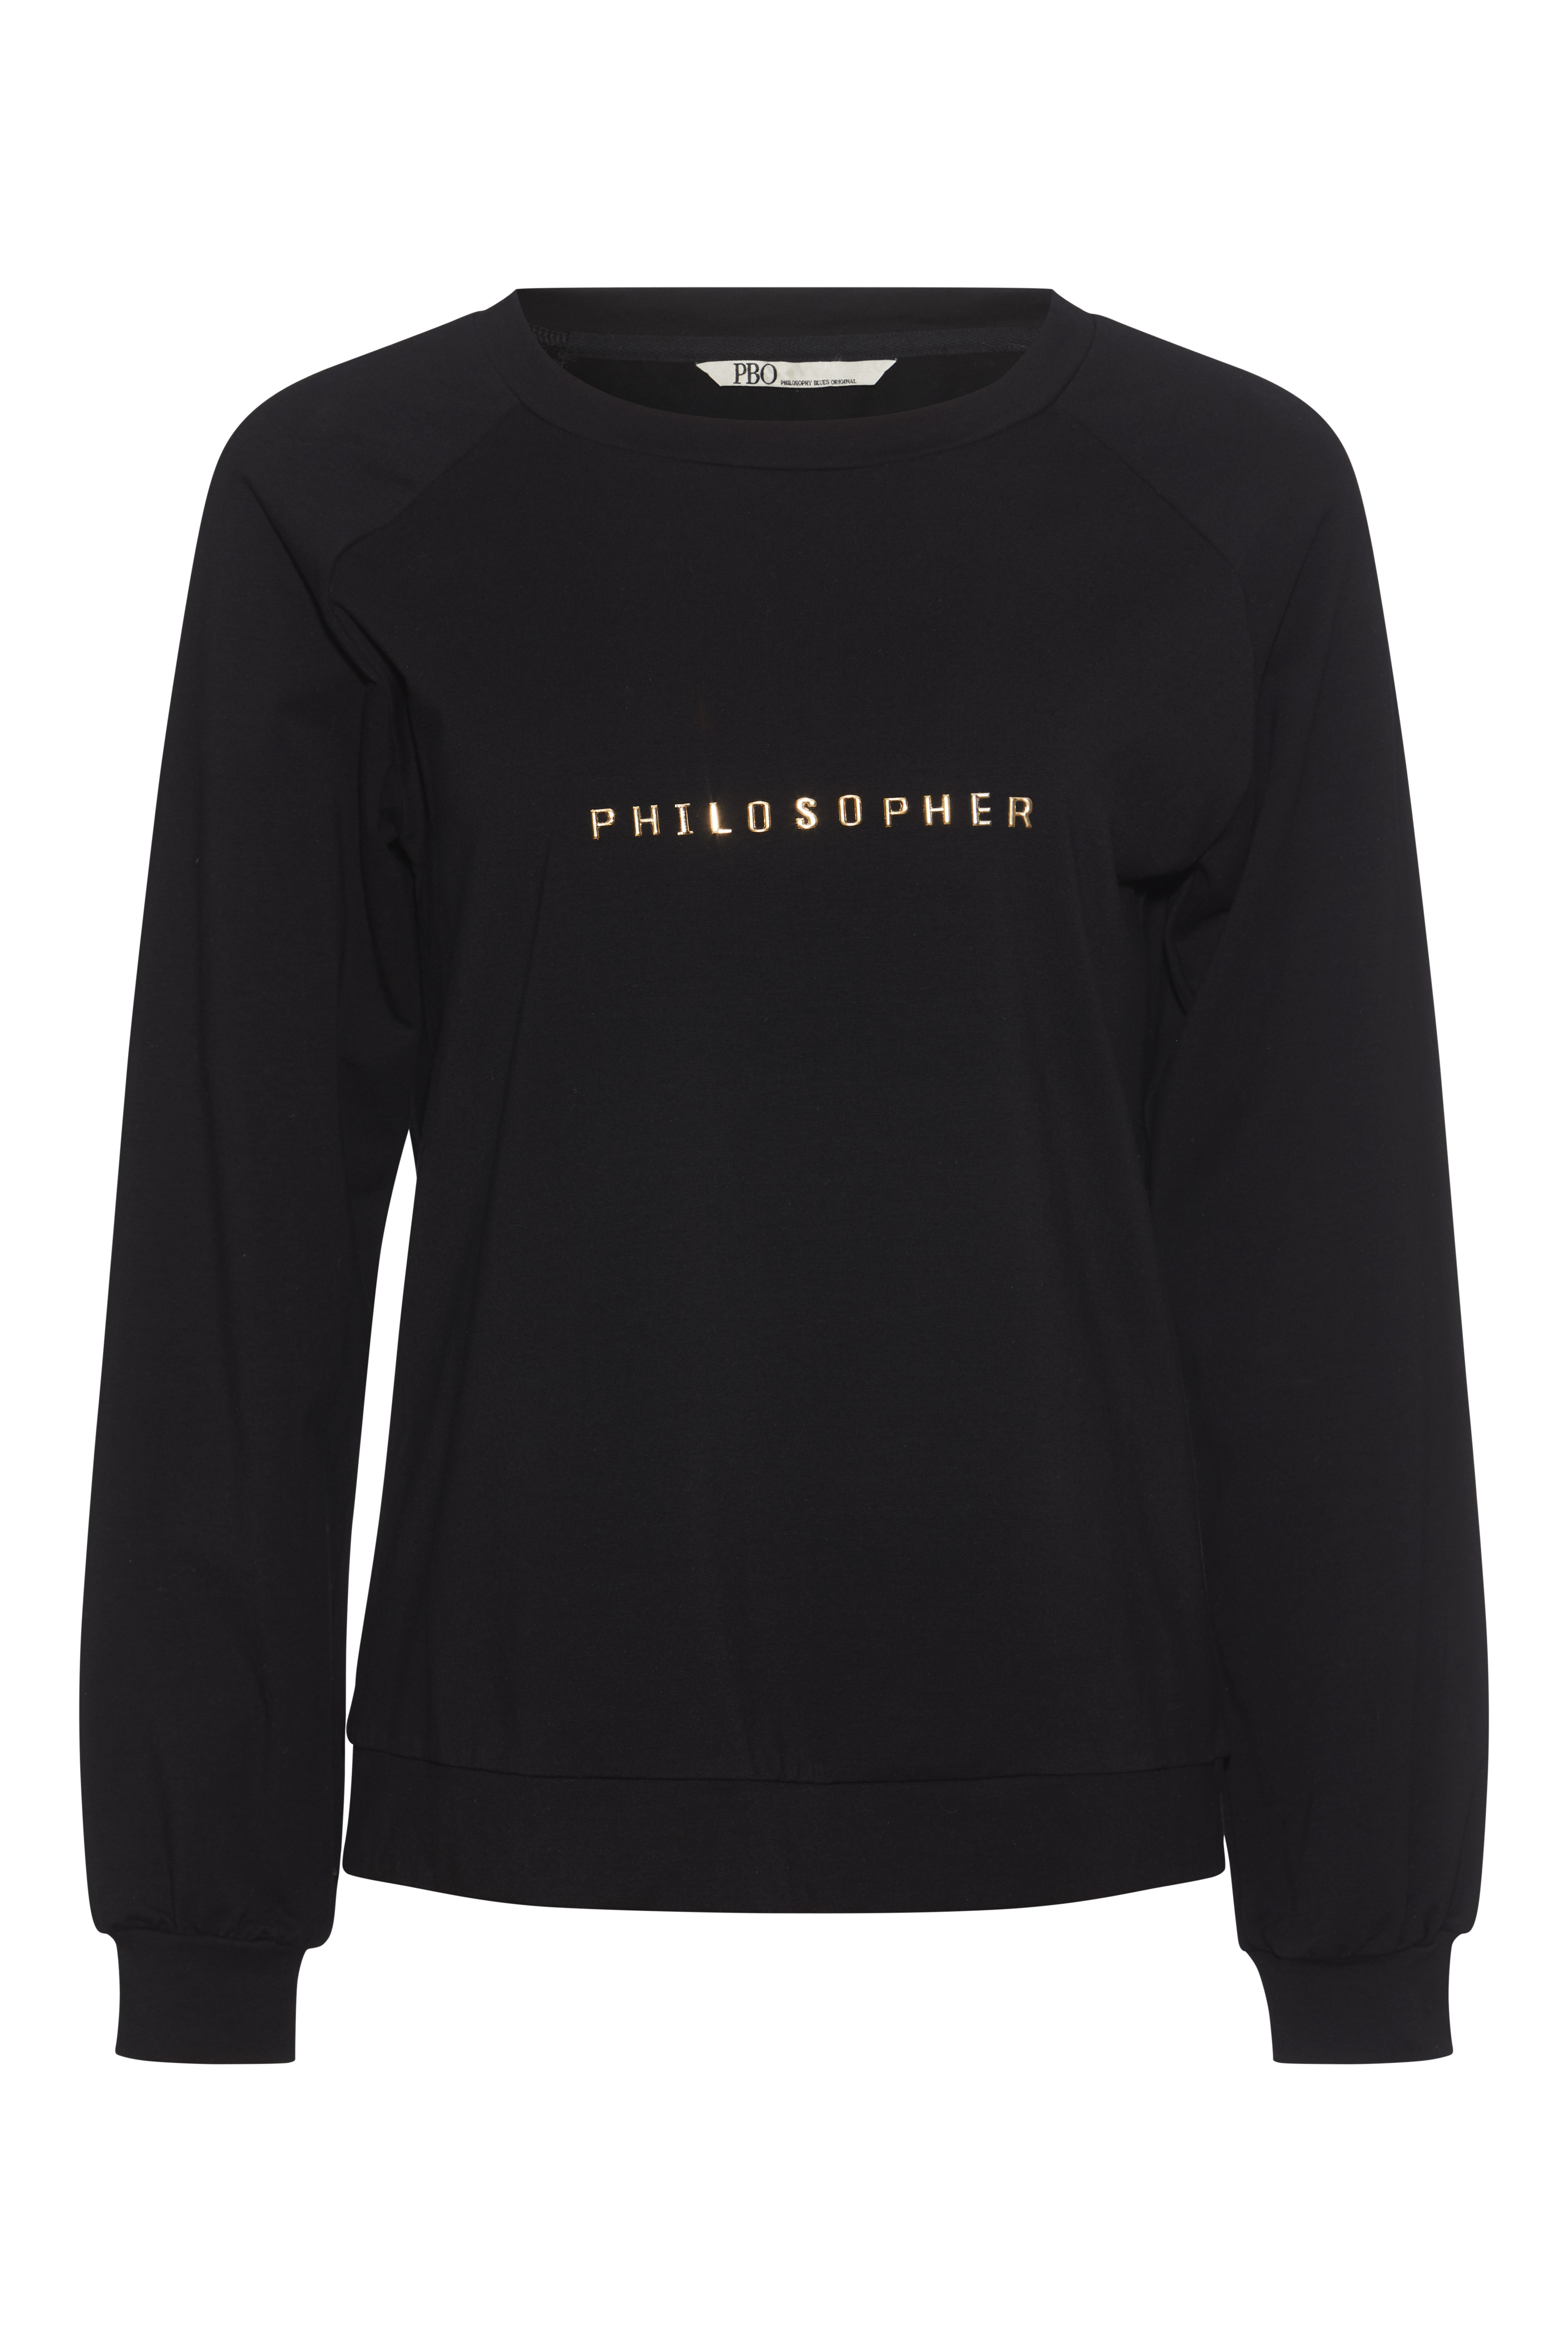 PBO Folsom sweatshirt, black, medium